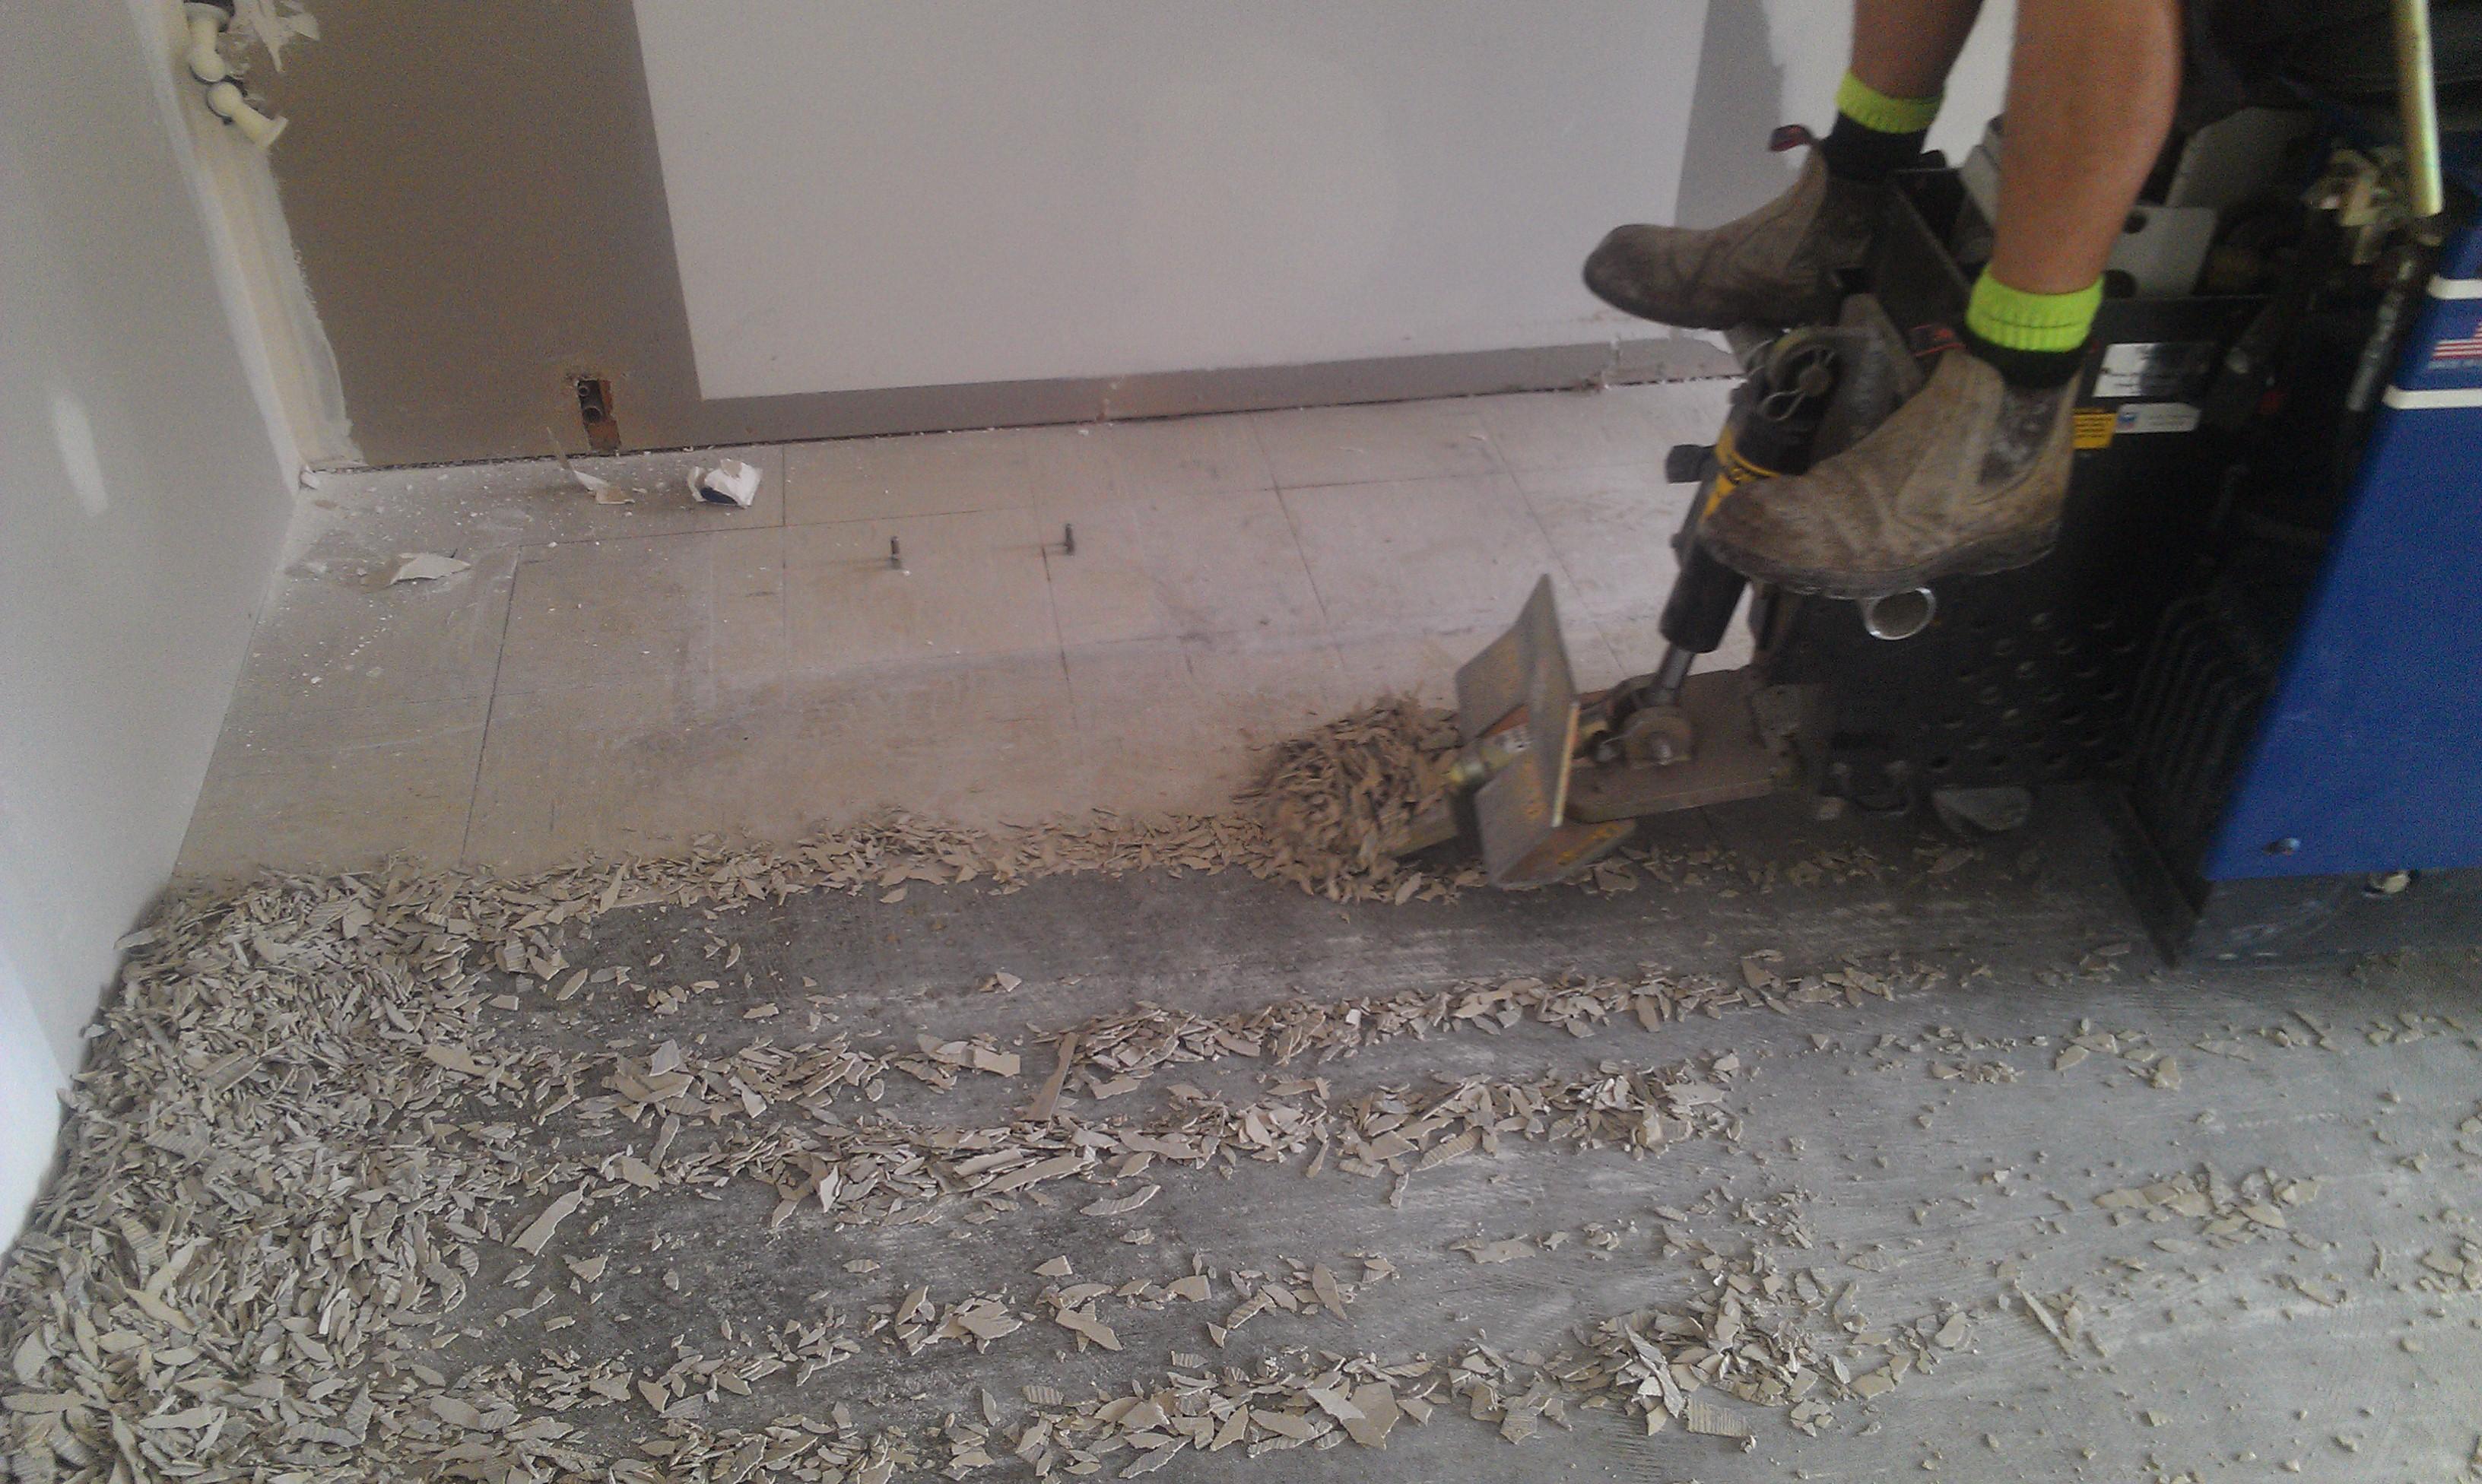 watch old removing machine it floors stripper stripping floor youtube coatings sealers aqua strip sts seal